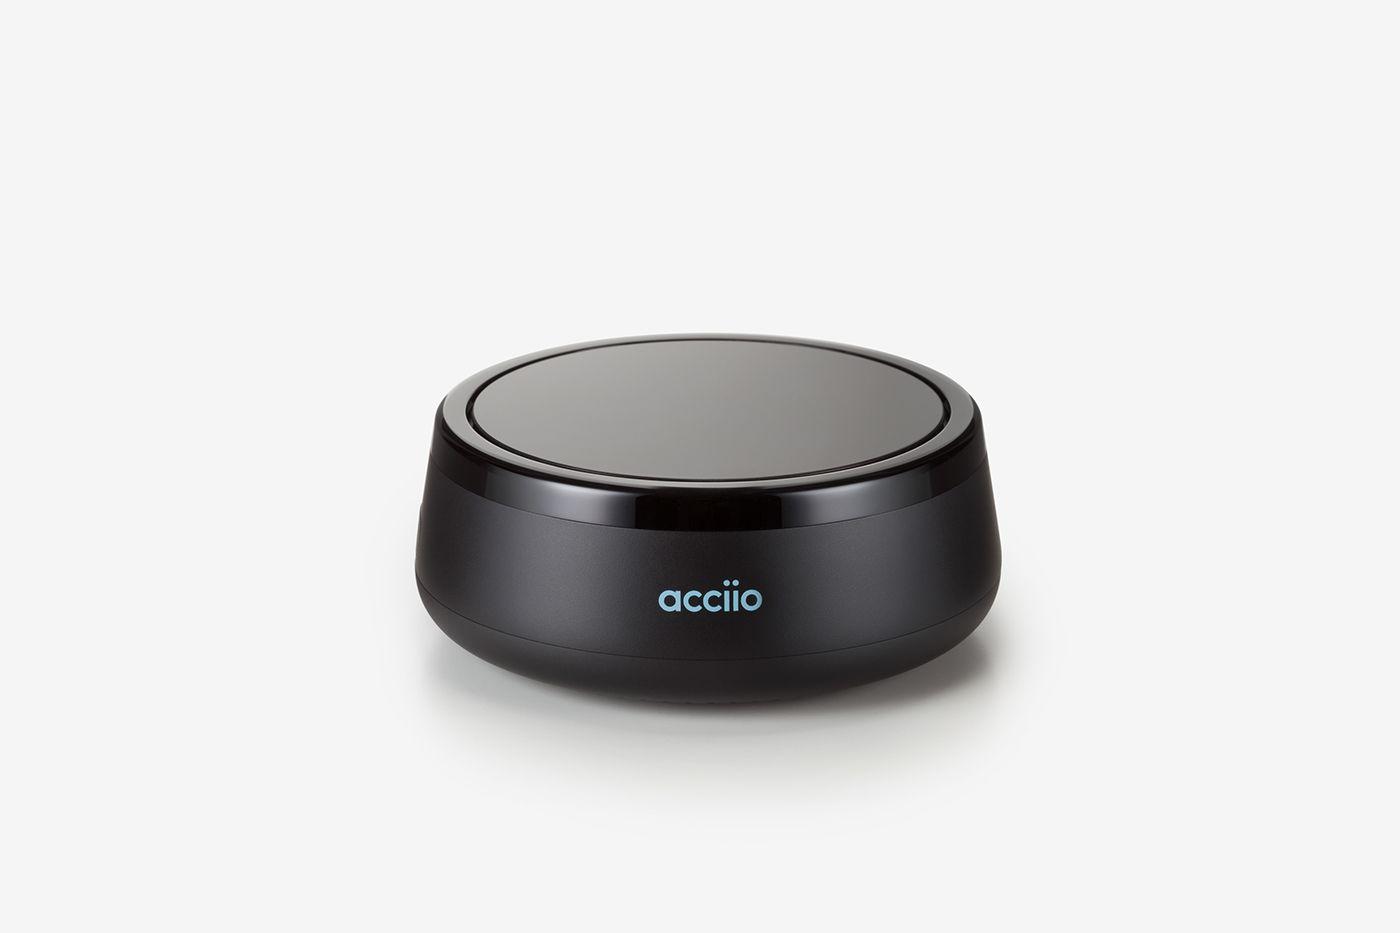 ACCIIO Air on Behance | Interactive design, Design details